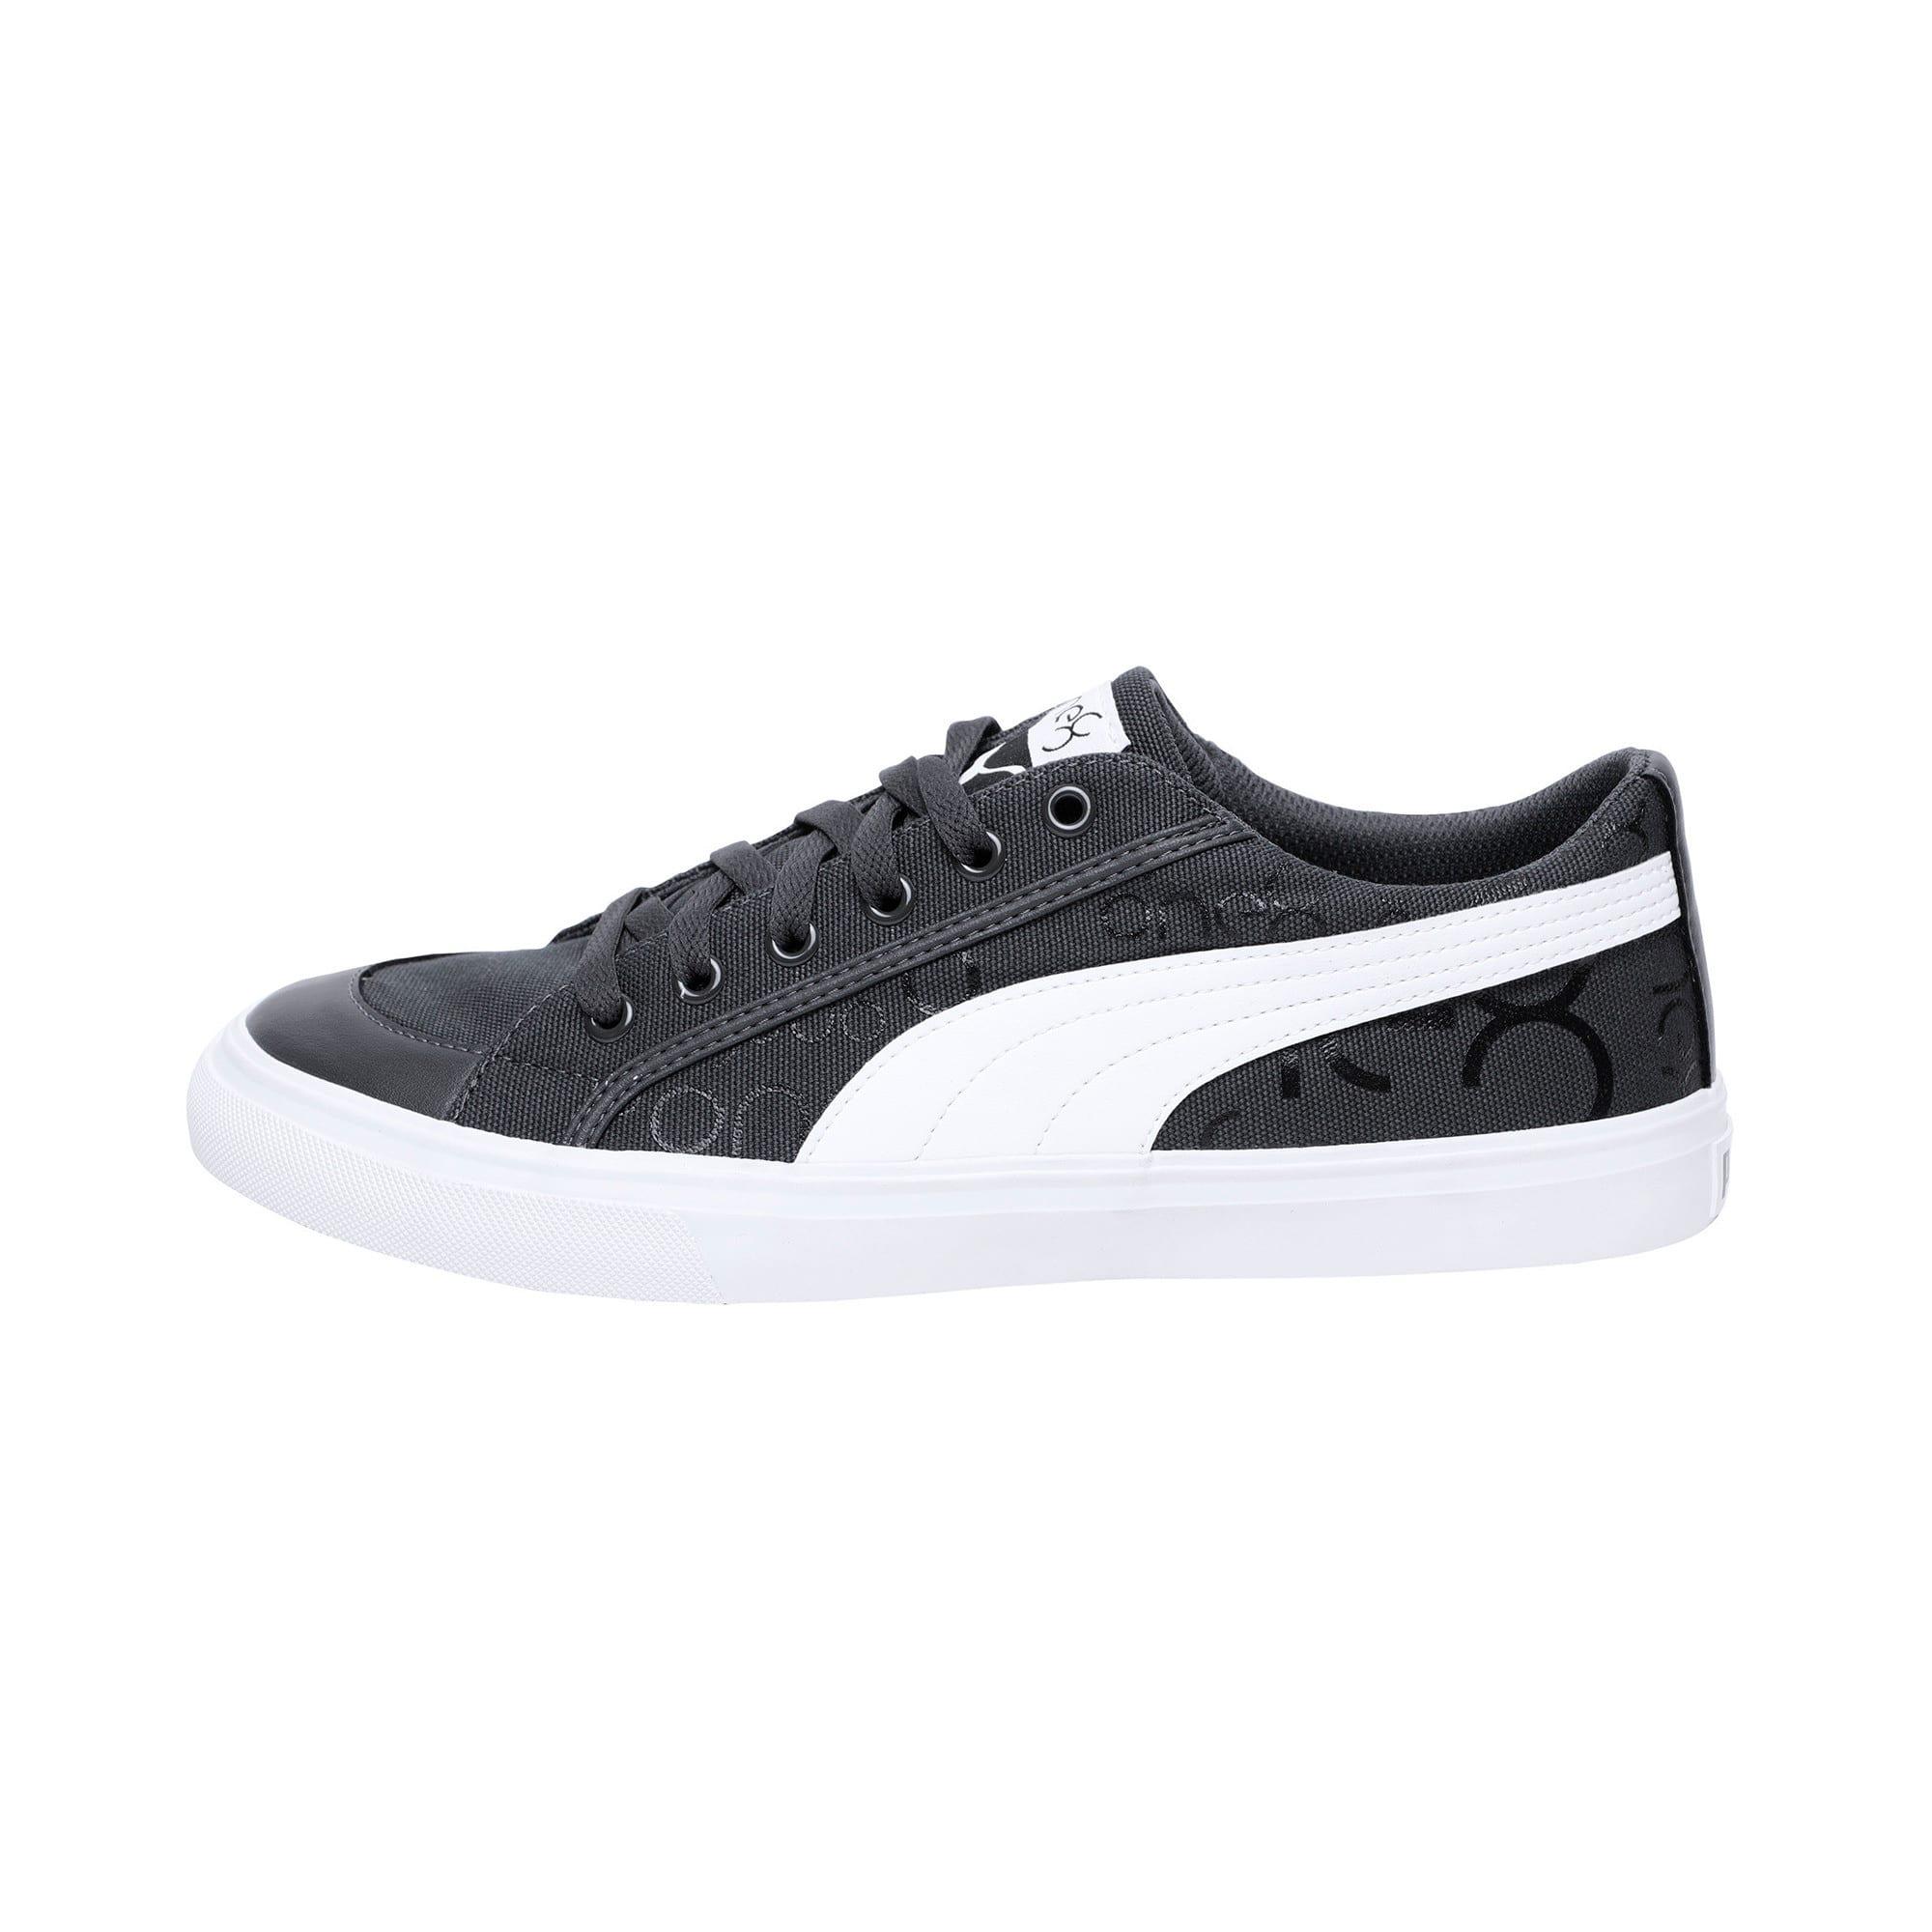 Thumbnail 1 of one8 Men's Sneakers, Iron Gate-Puma White-Black, medium-IND